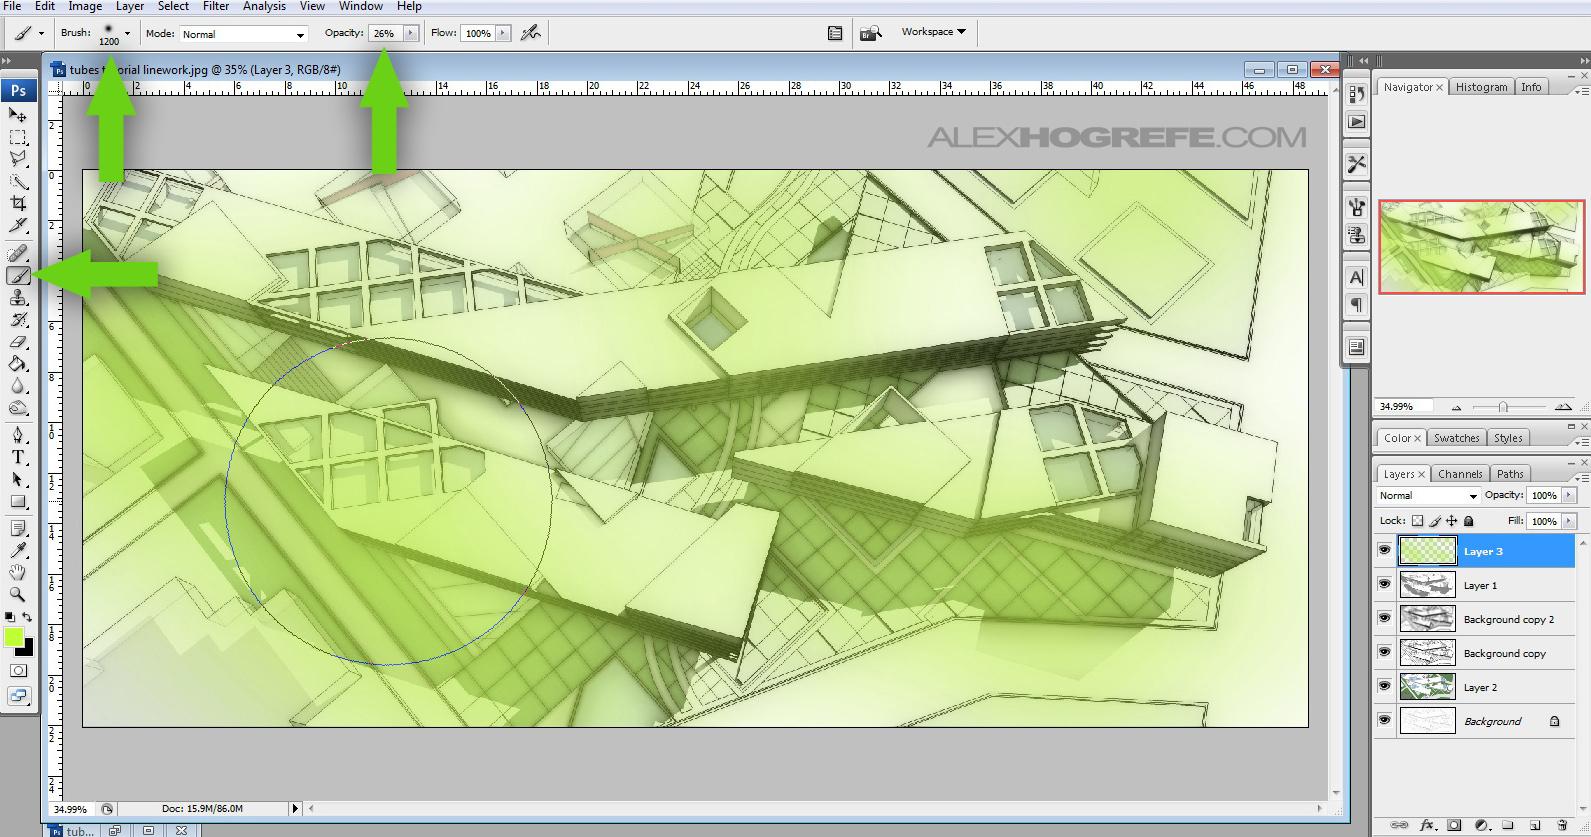 92_color_overlay_alex_hogrefe_architecture.jpg